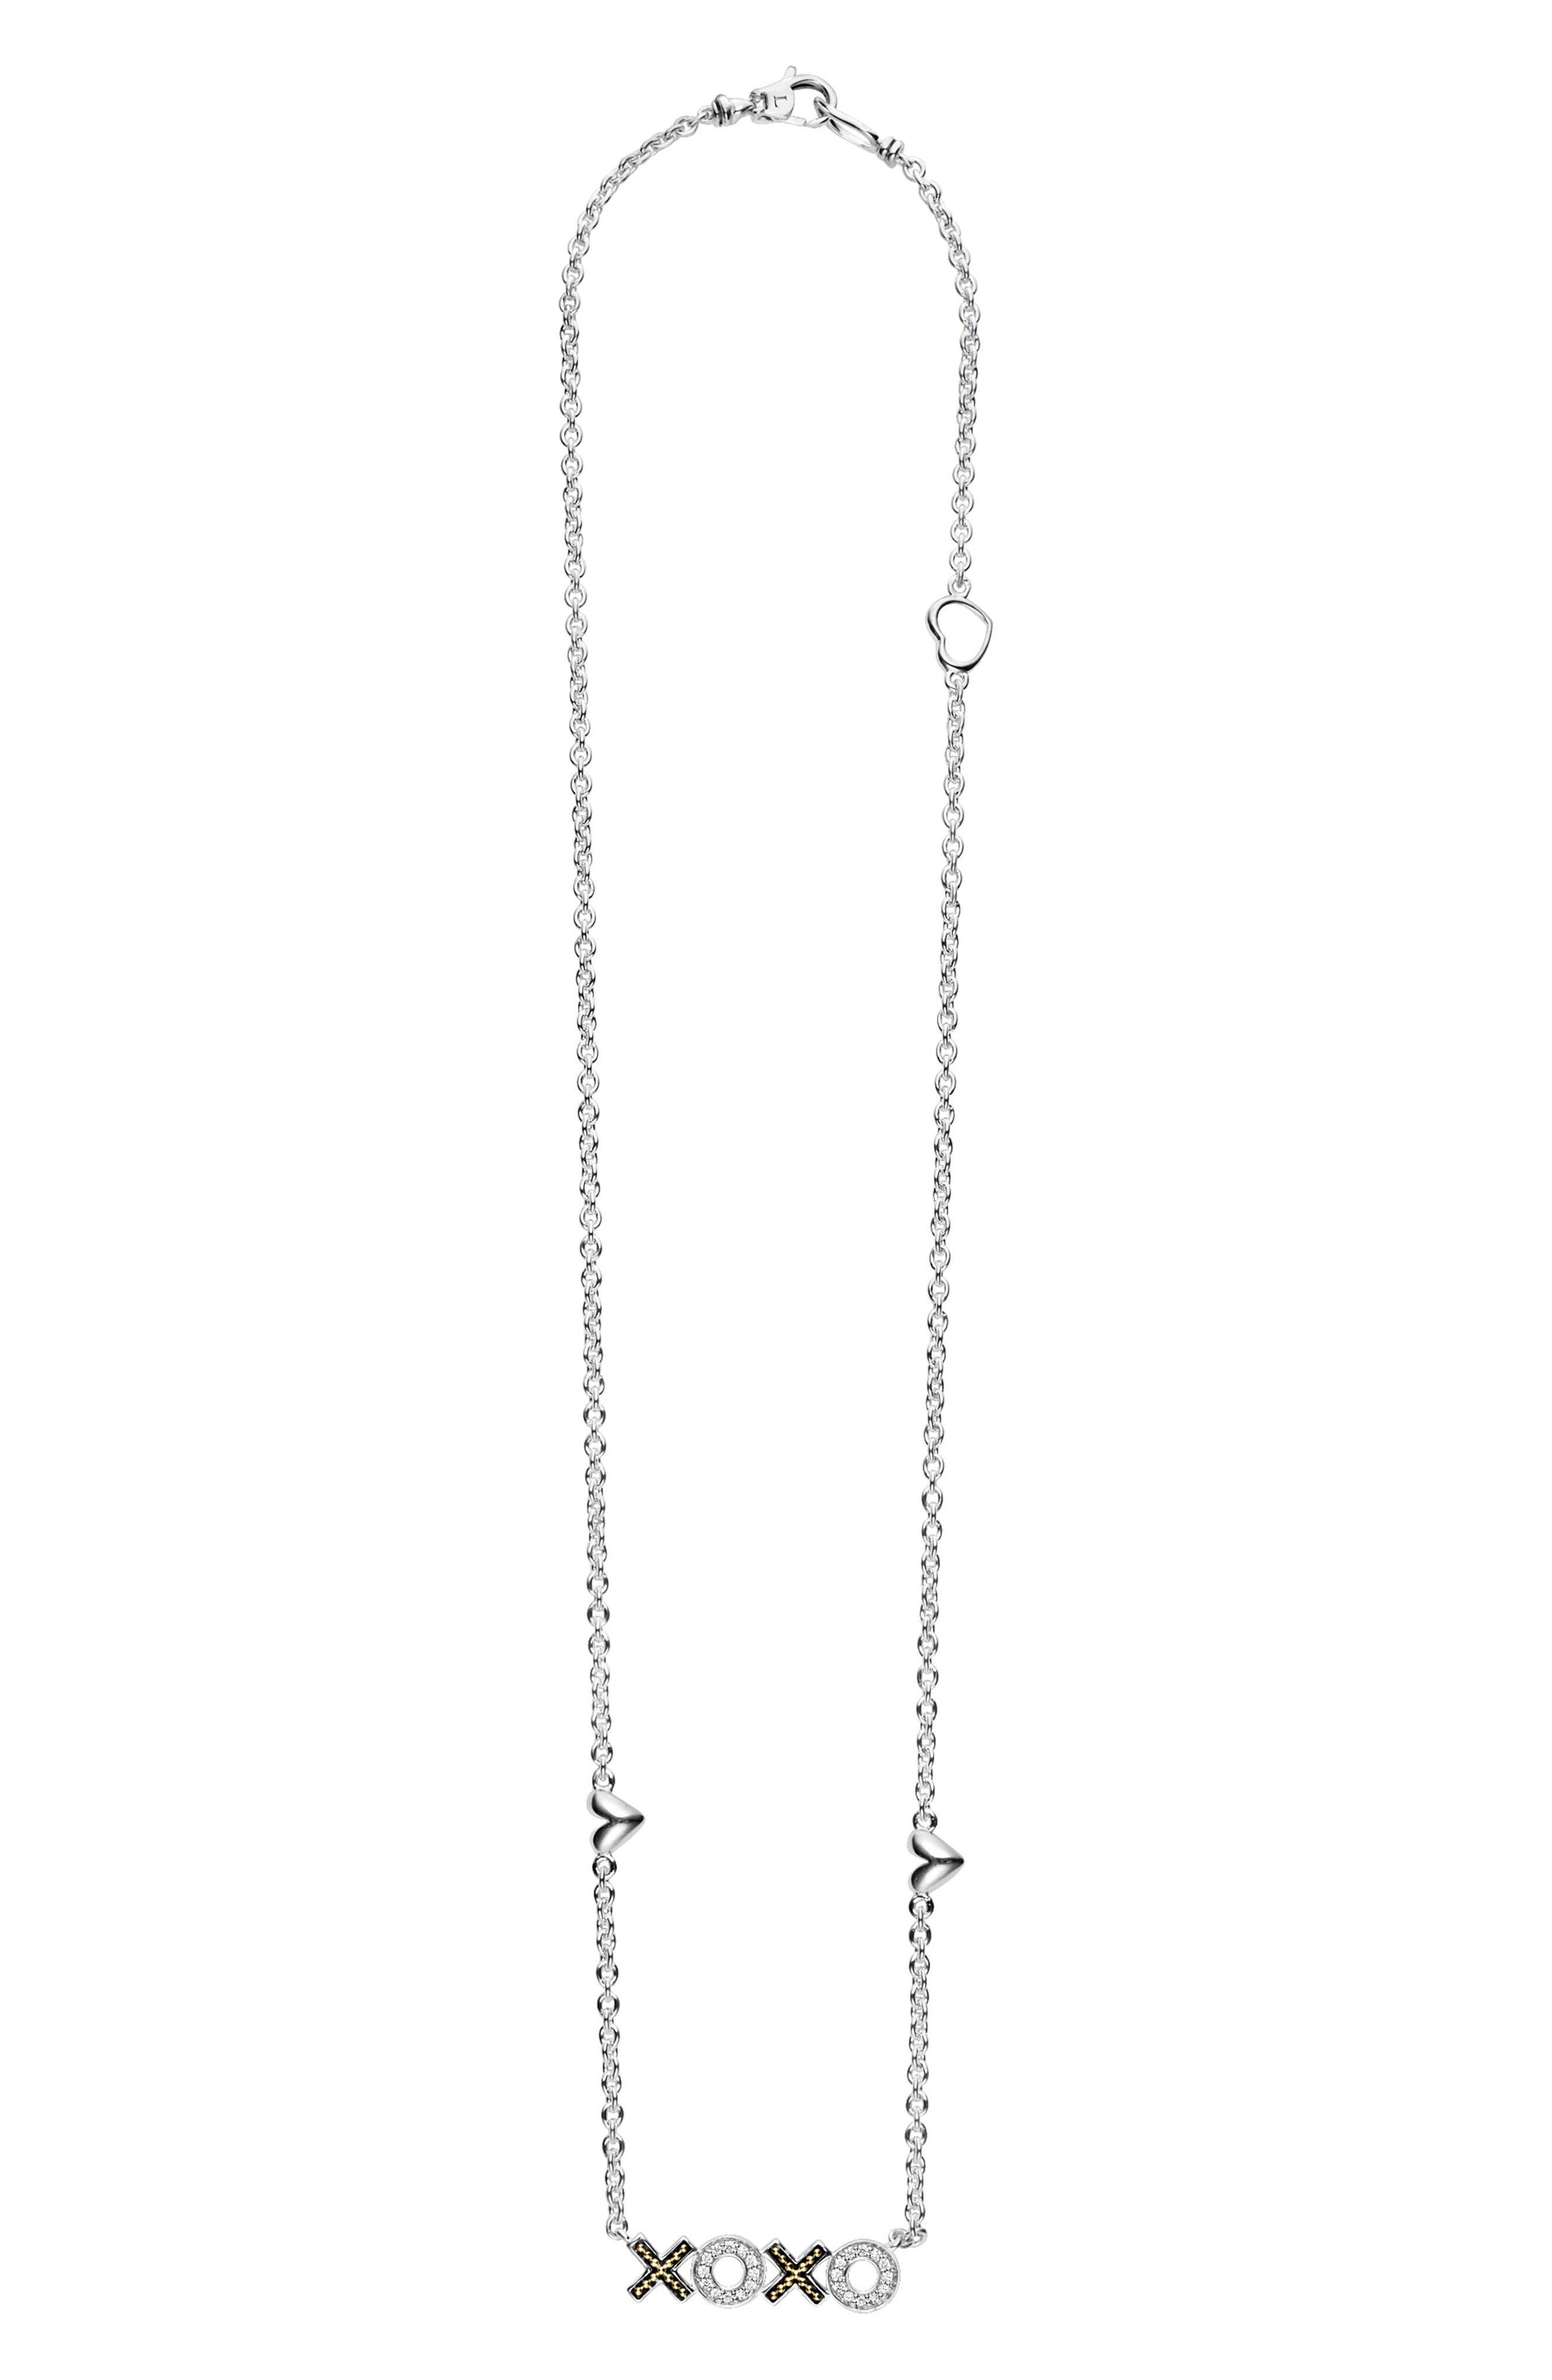 Beloved Diamond XOXO Chain Necklace,                             Main thumbnail 1, color,                             Silver/ Diamond